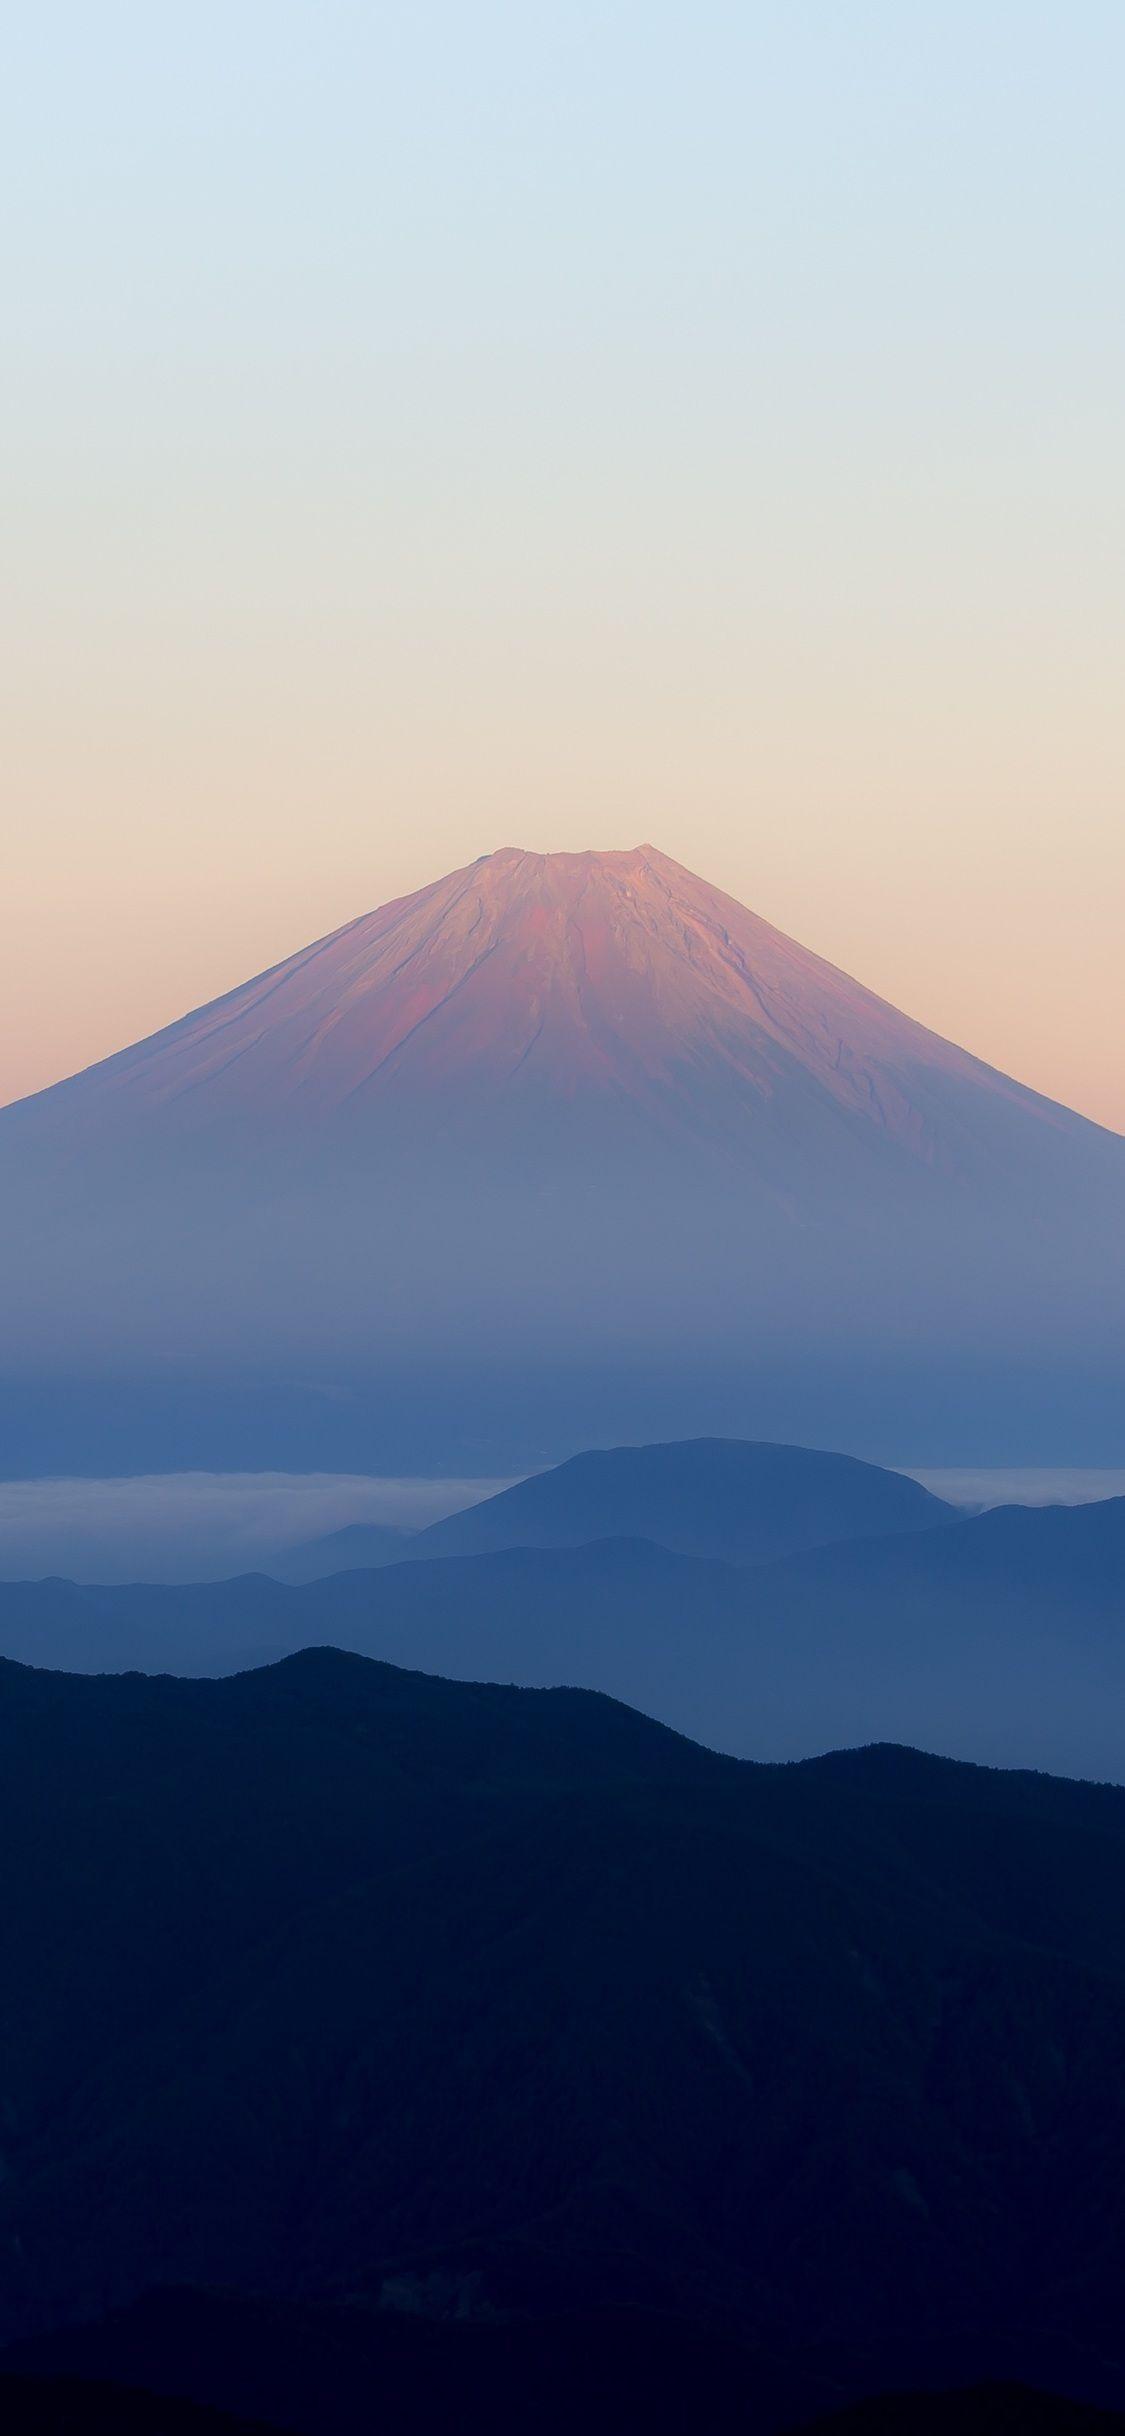 Mt Fuji 4k Wallpapers Top Free Mt Fuji 4k Backgrounds